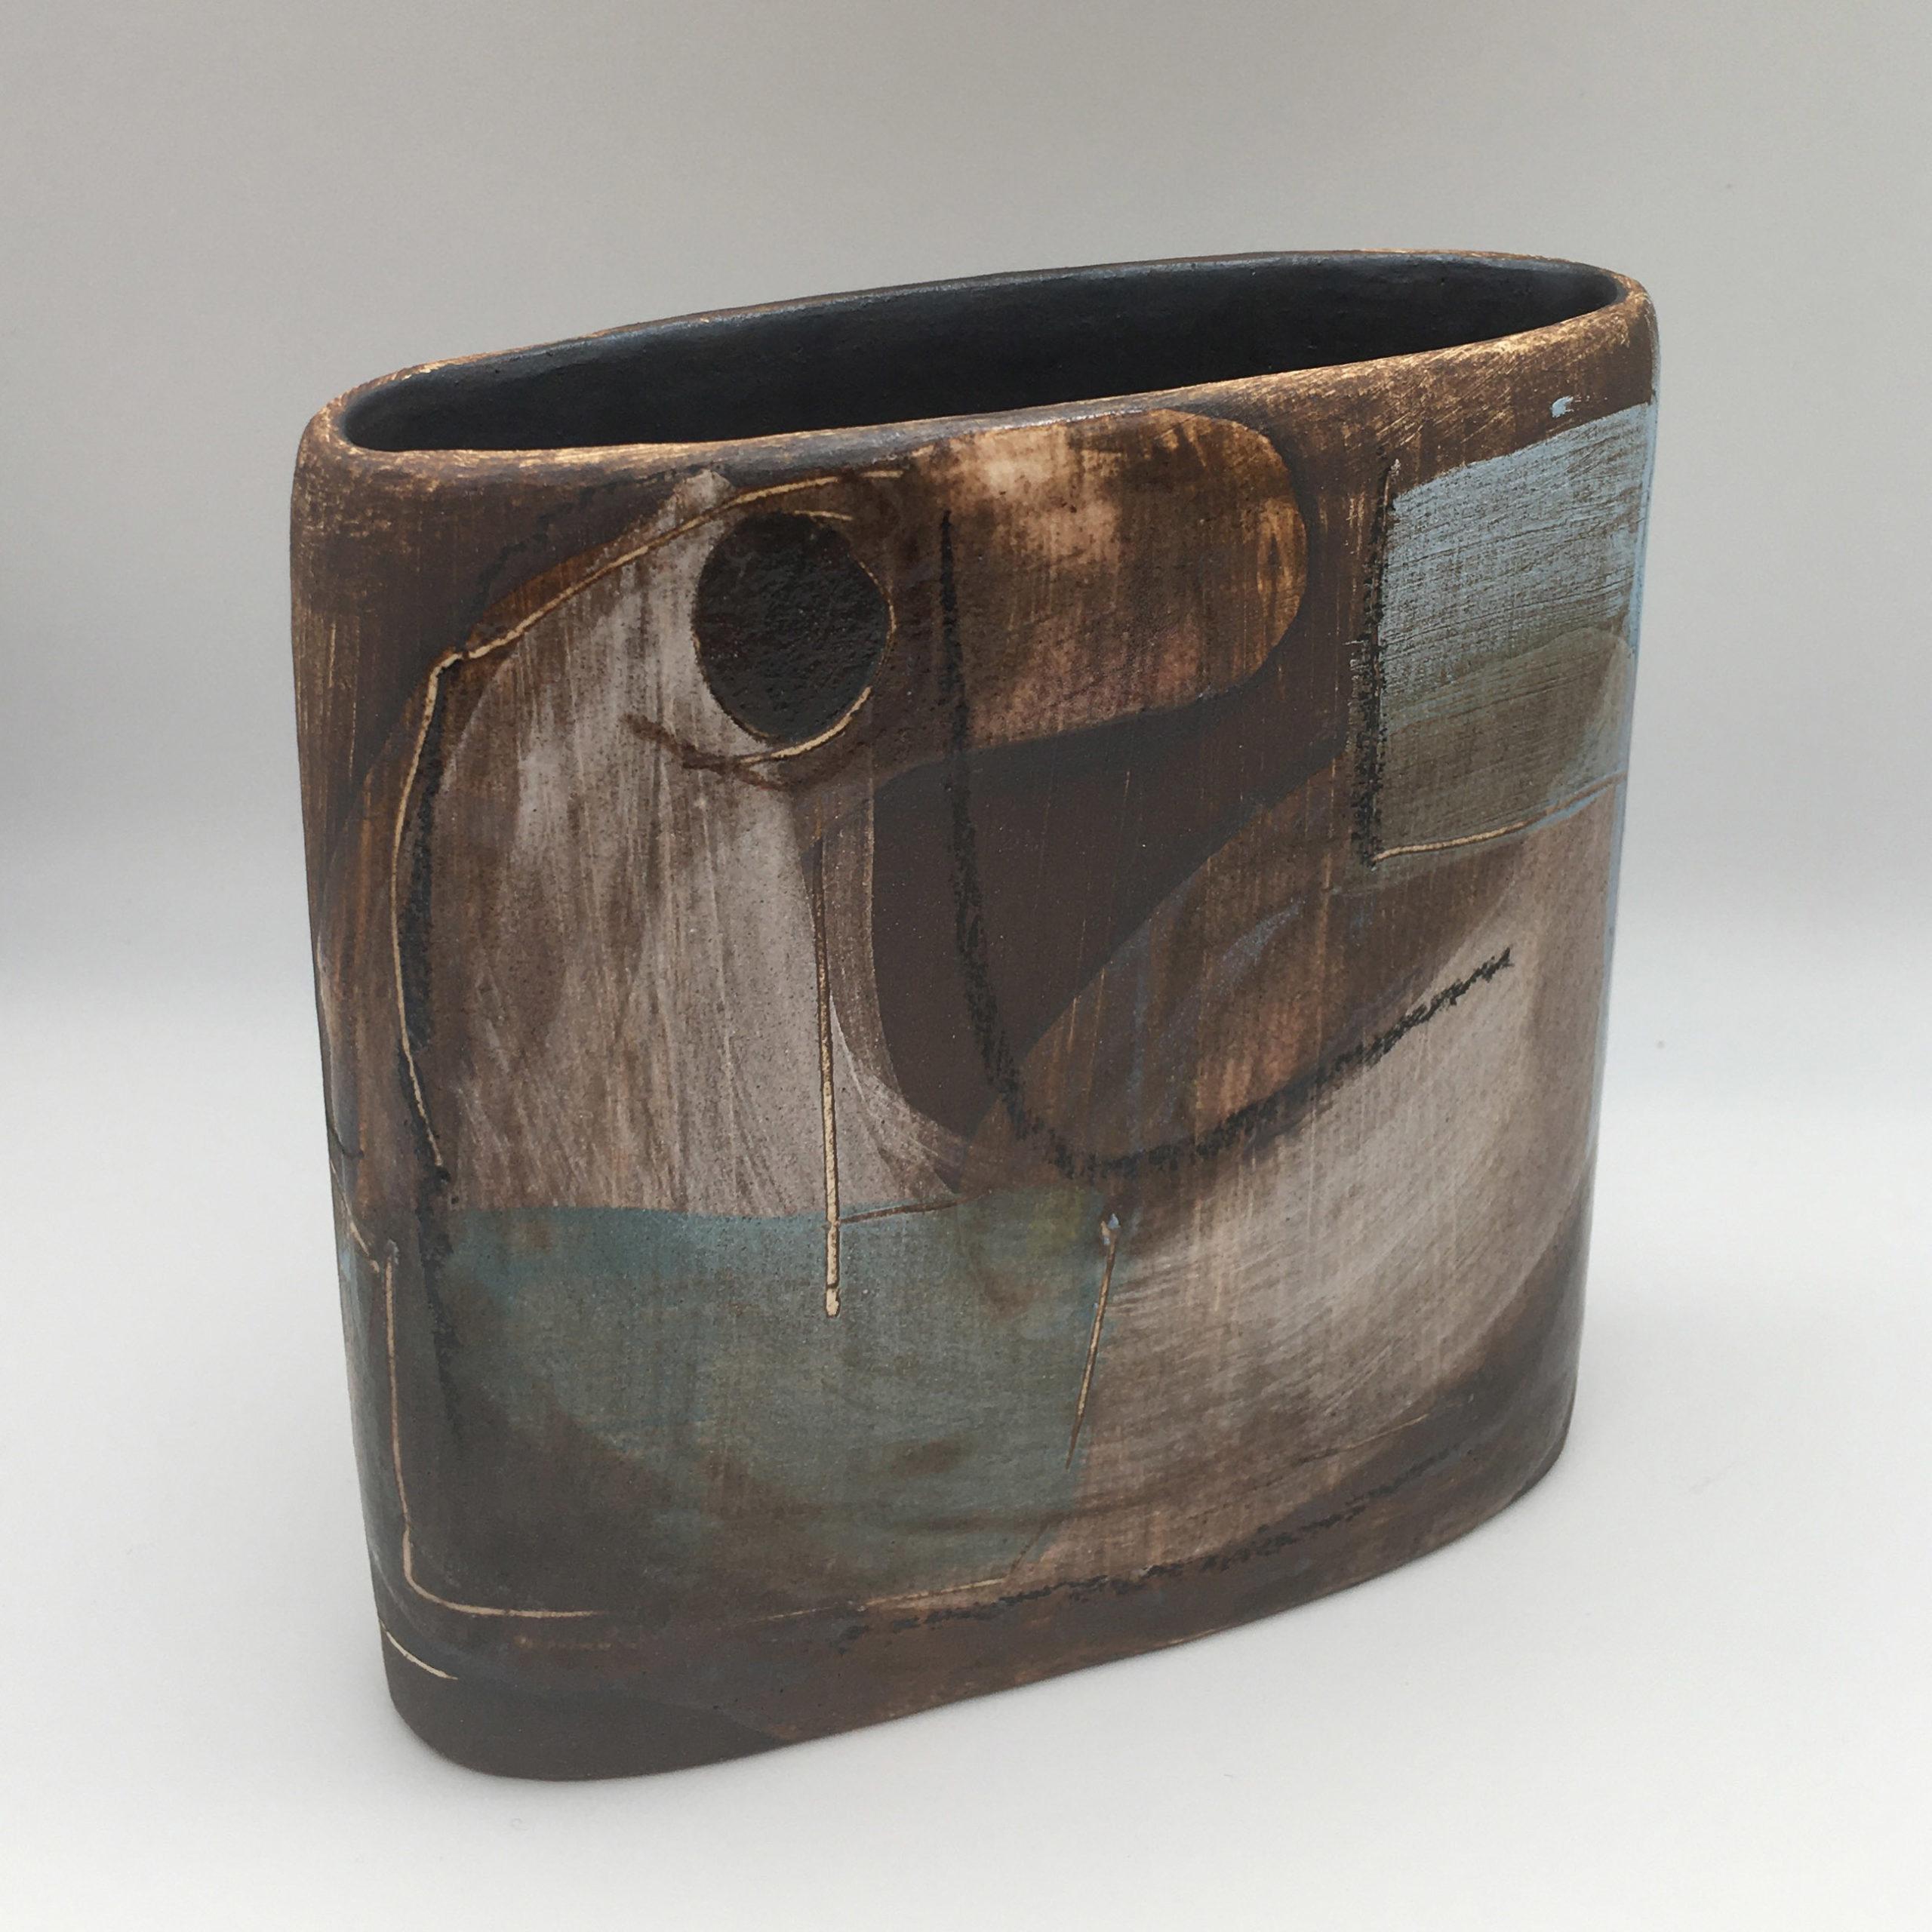 The Bird vase, ceramics by Susan Luker